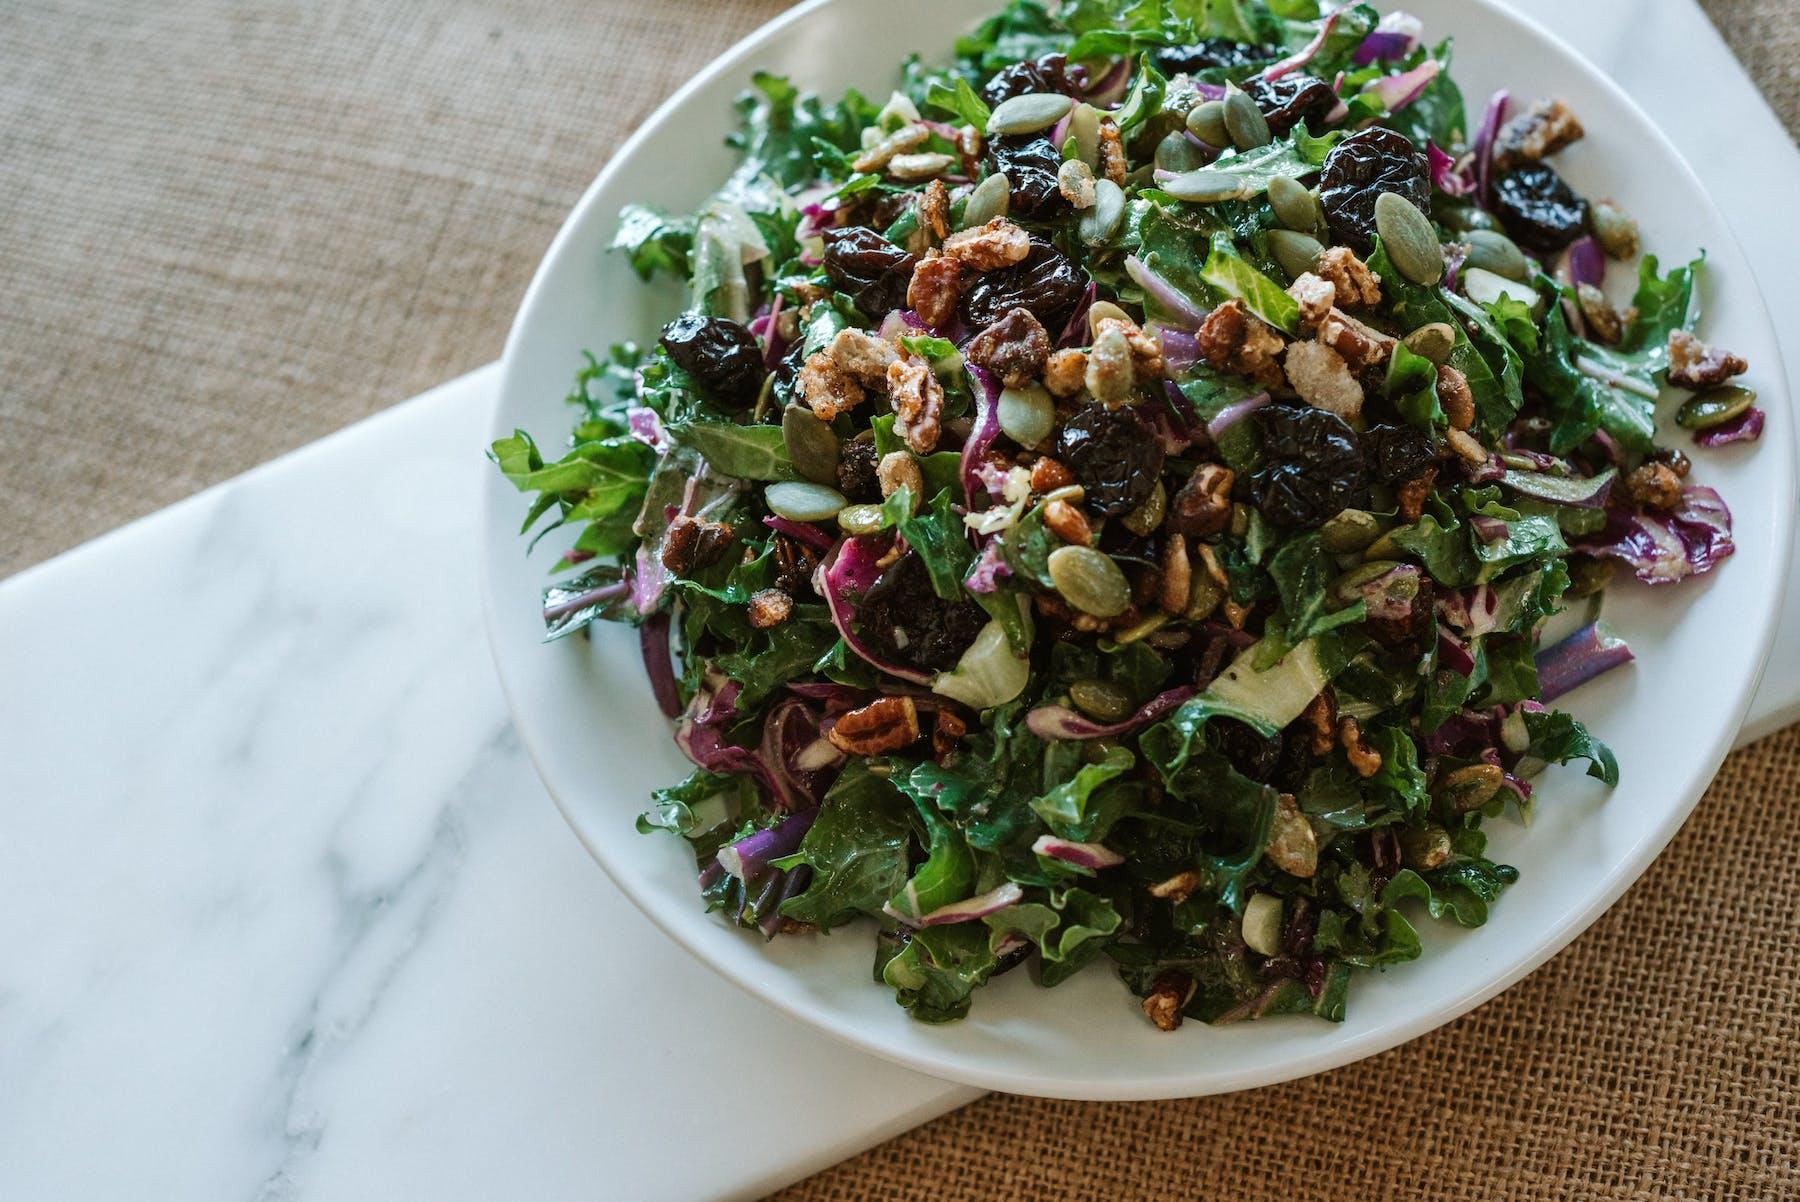 Kale Signature Salad